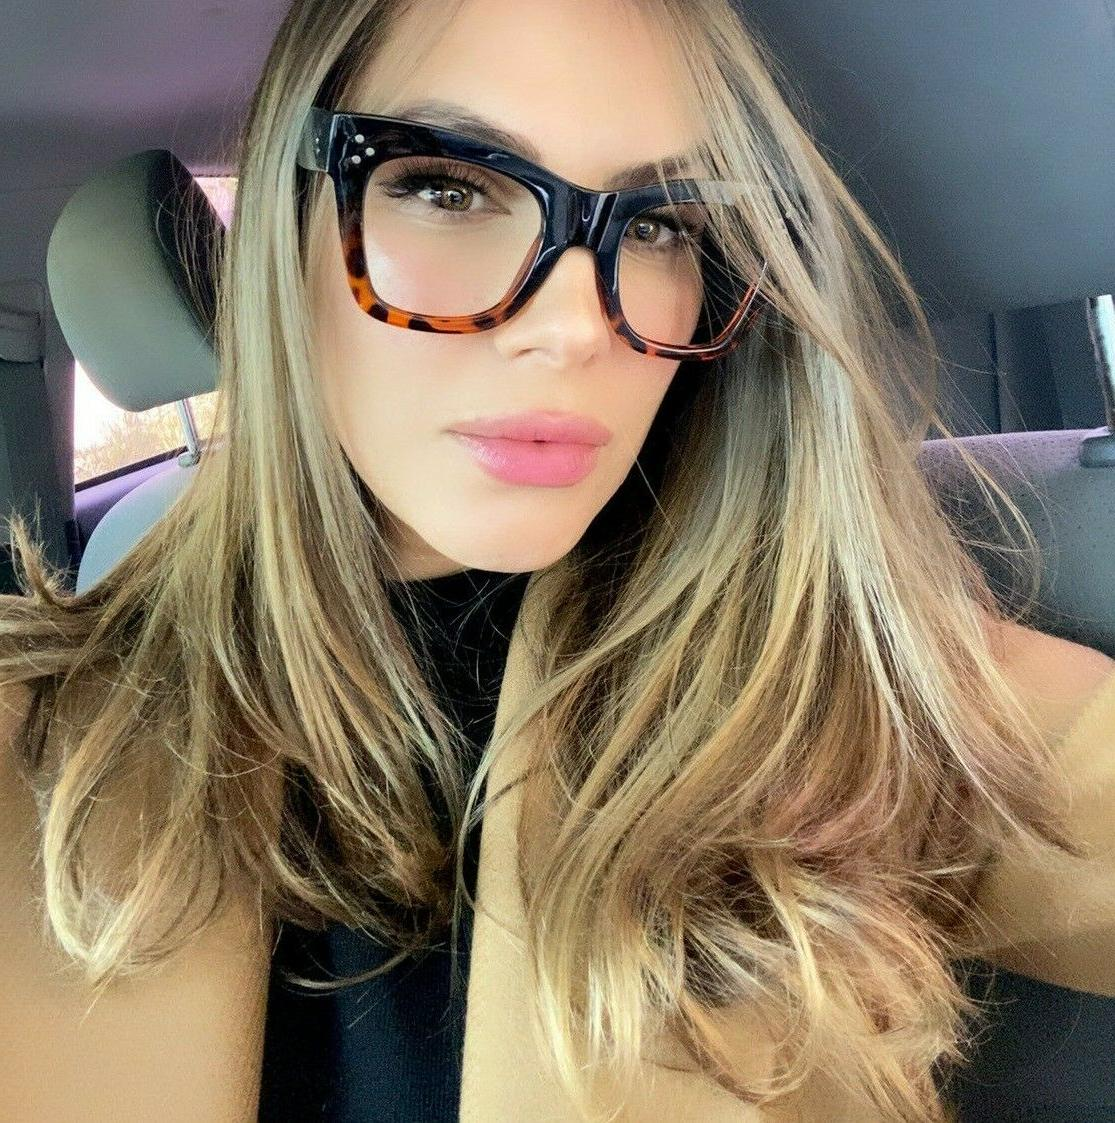 Big XL SQUARE Vintage Retro NERD GEEK Women Eyeglasses CATHE